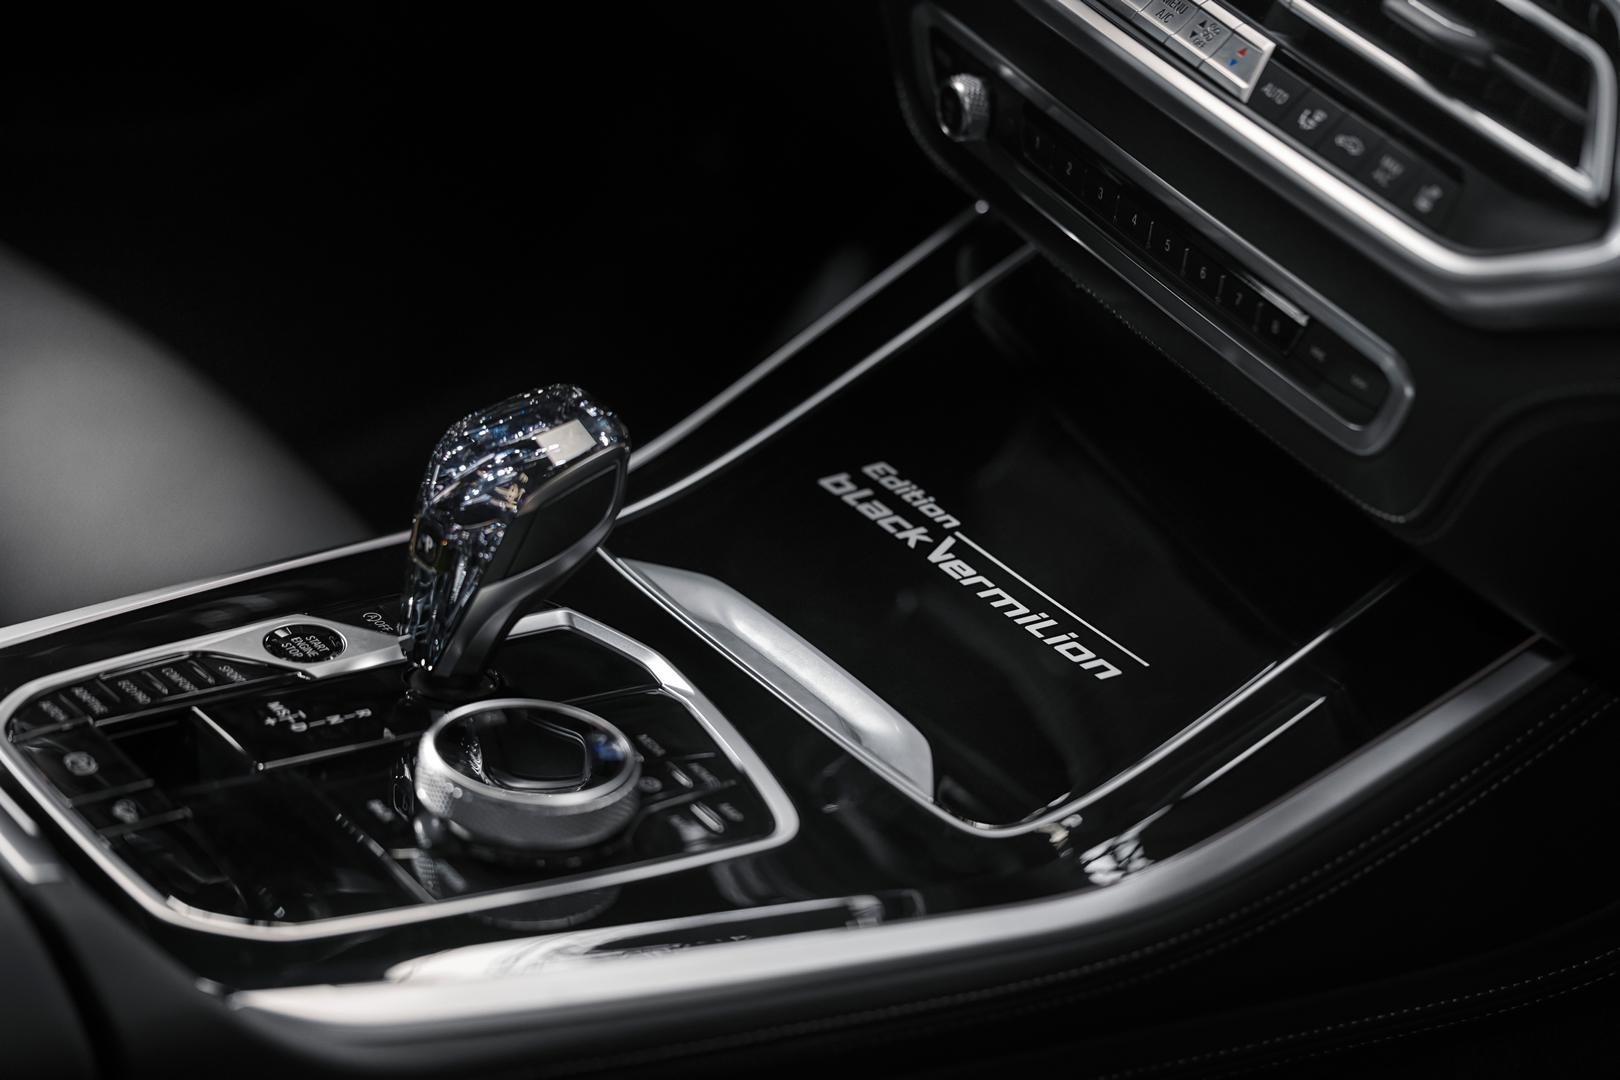 BMW center console